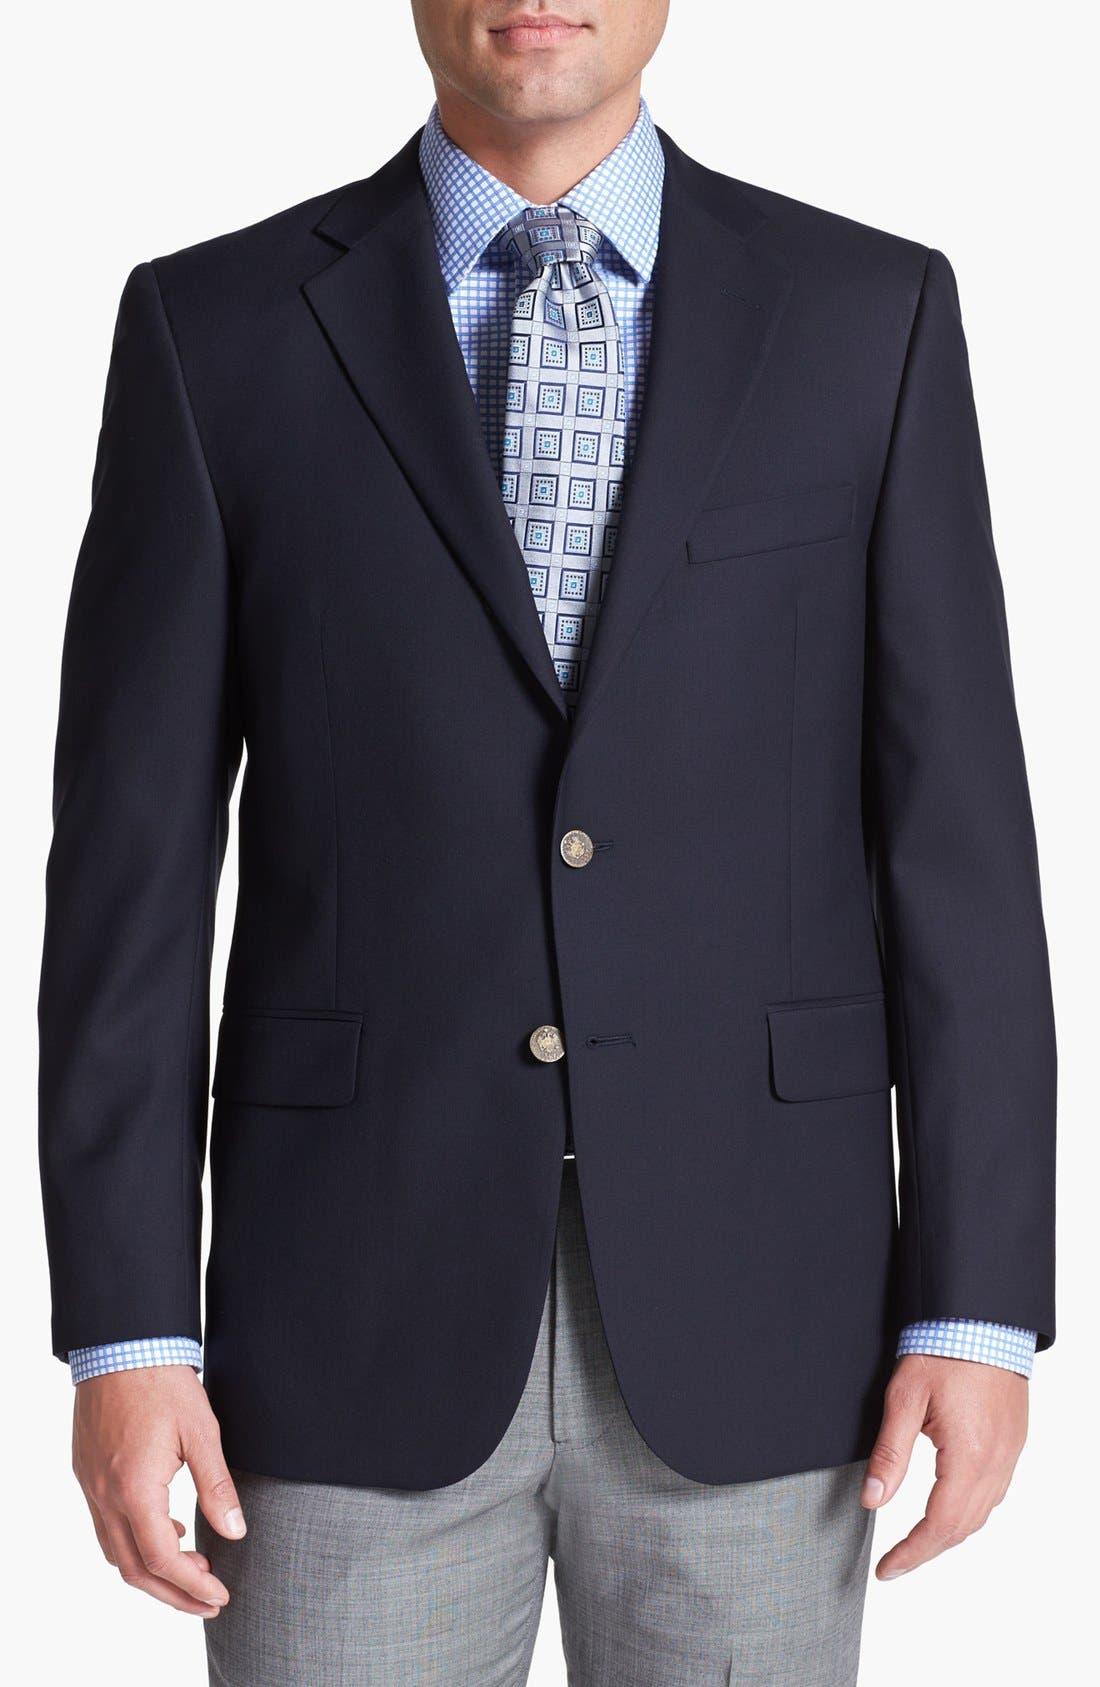 Main Image - Hickey Freeman Navy Wool Blazer